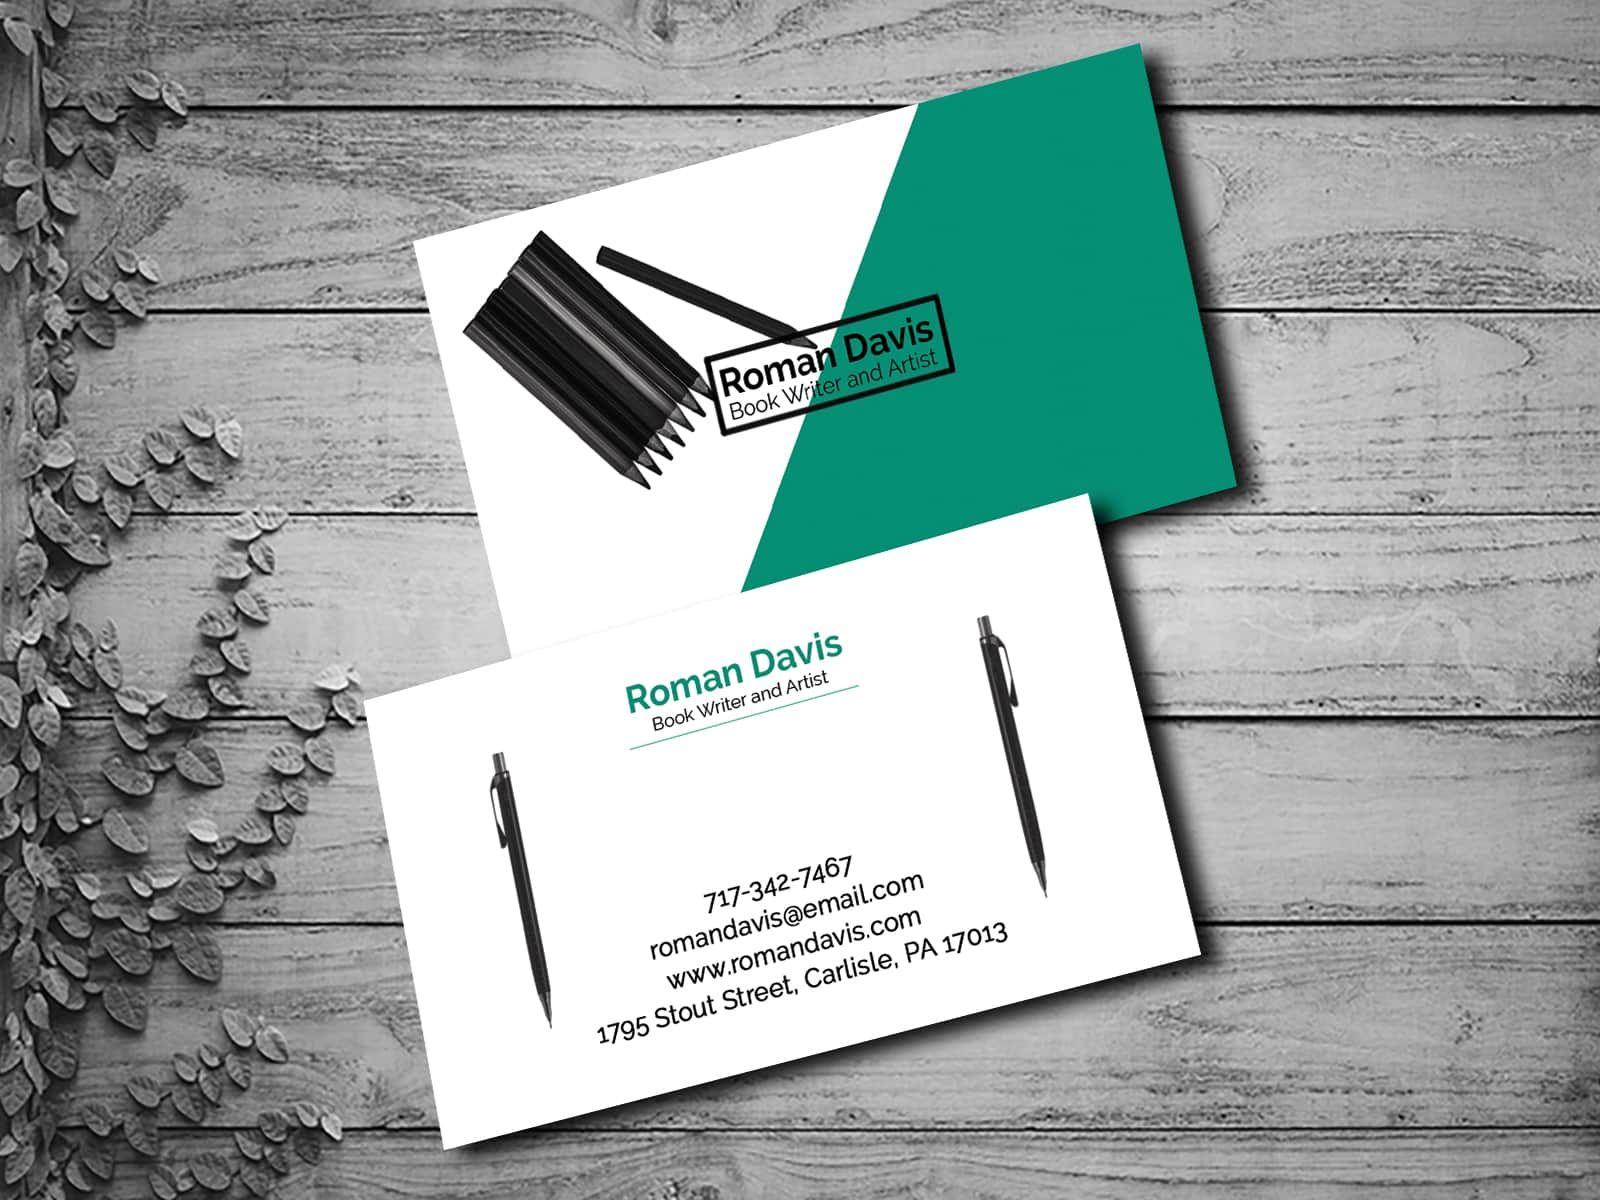 Writer Business Card Design Business Card Design Business Cards Collection Card Design